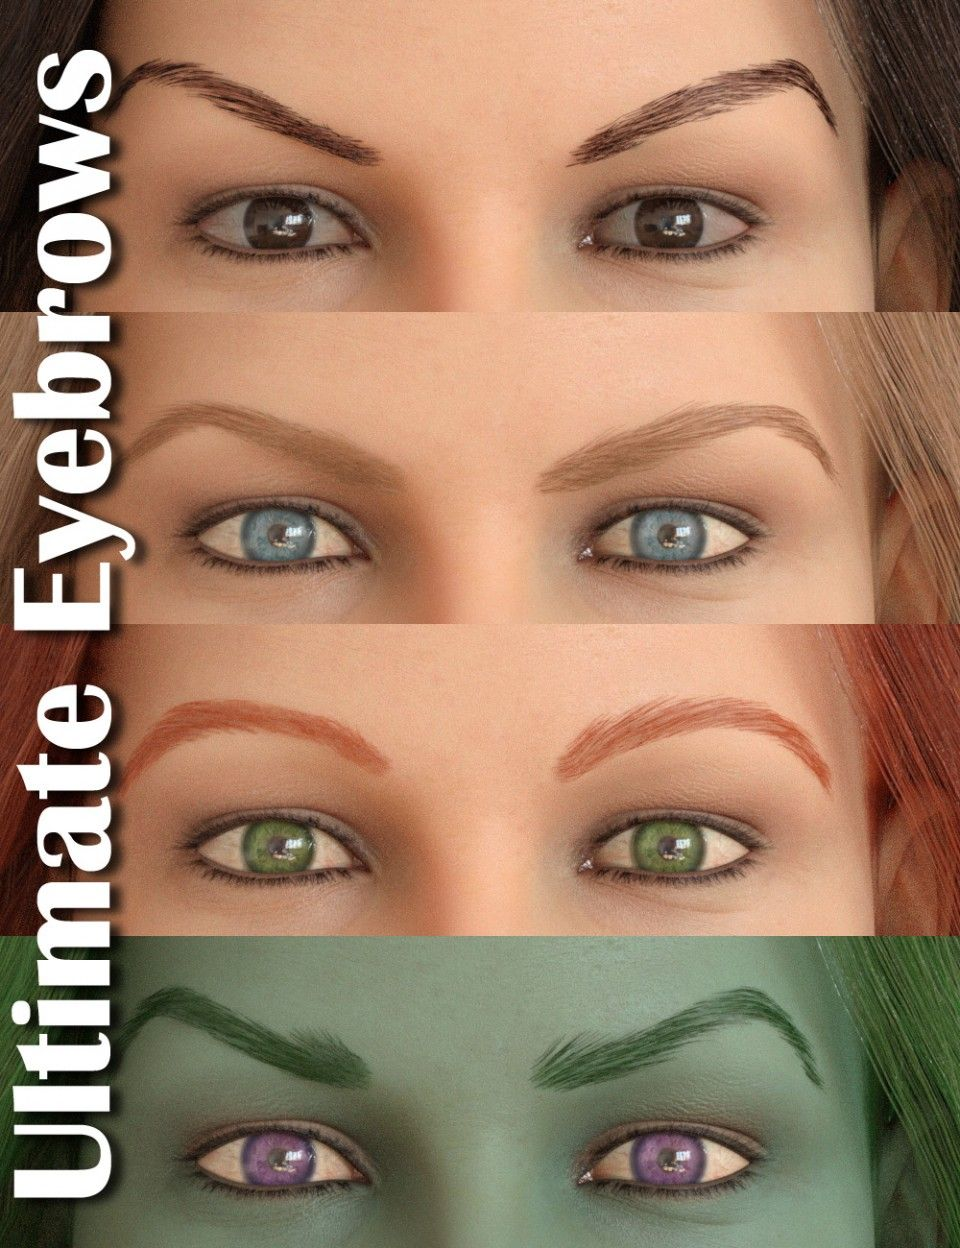 Ultimate Eyebrows G8f Daz3d Hair Tools Pinterest Eyebrows